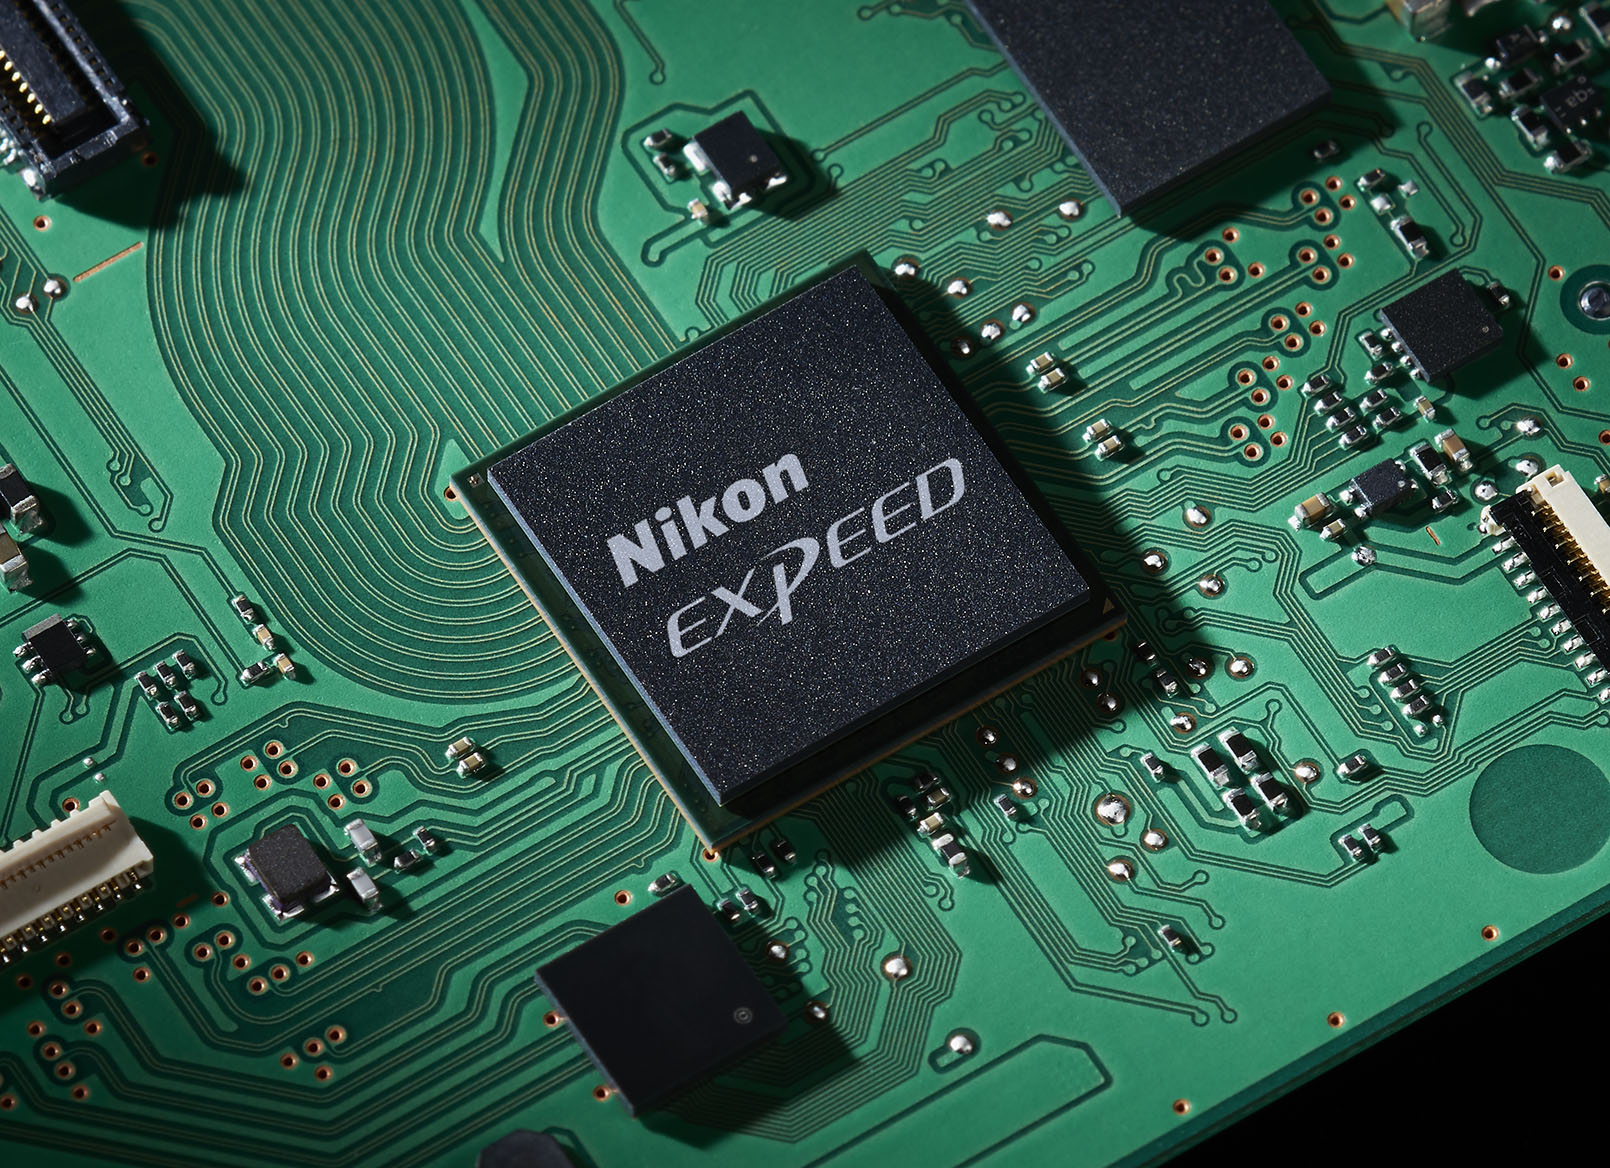 Nikon S New D850 Has 45 7 Megapixels And Enough Features